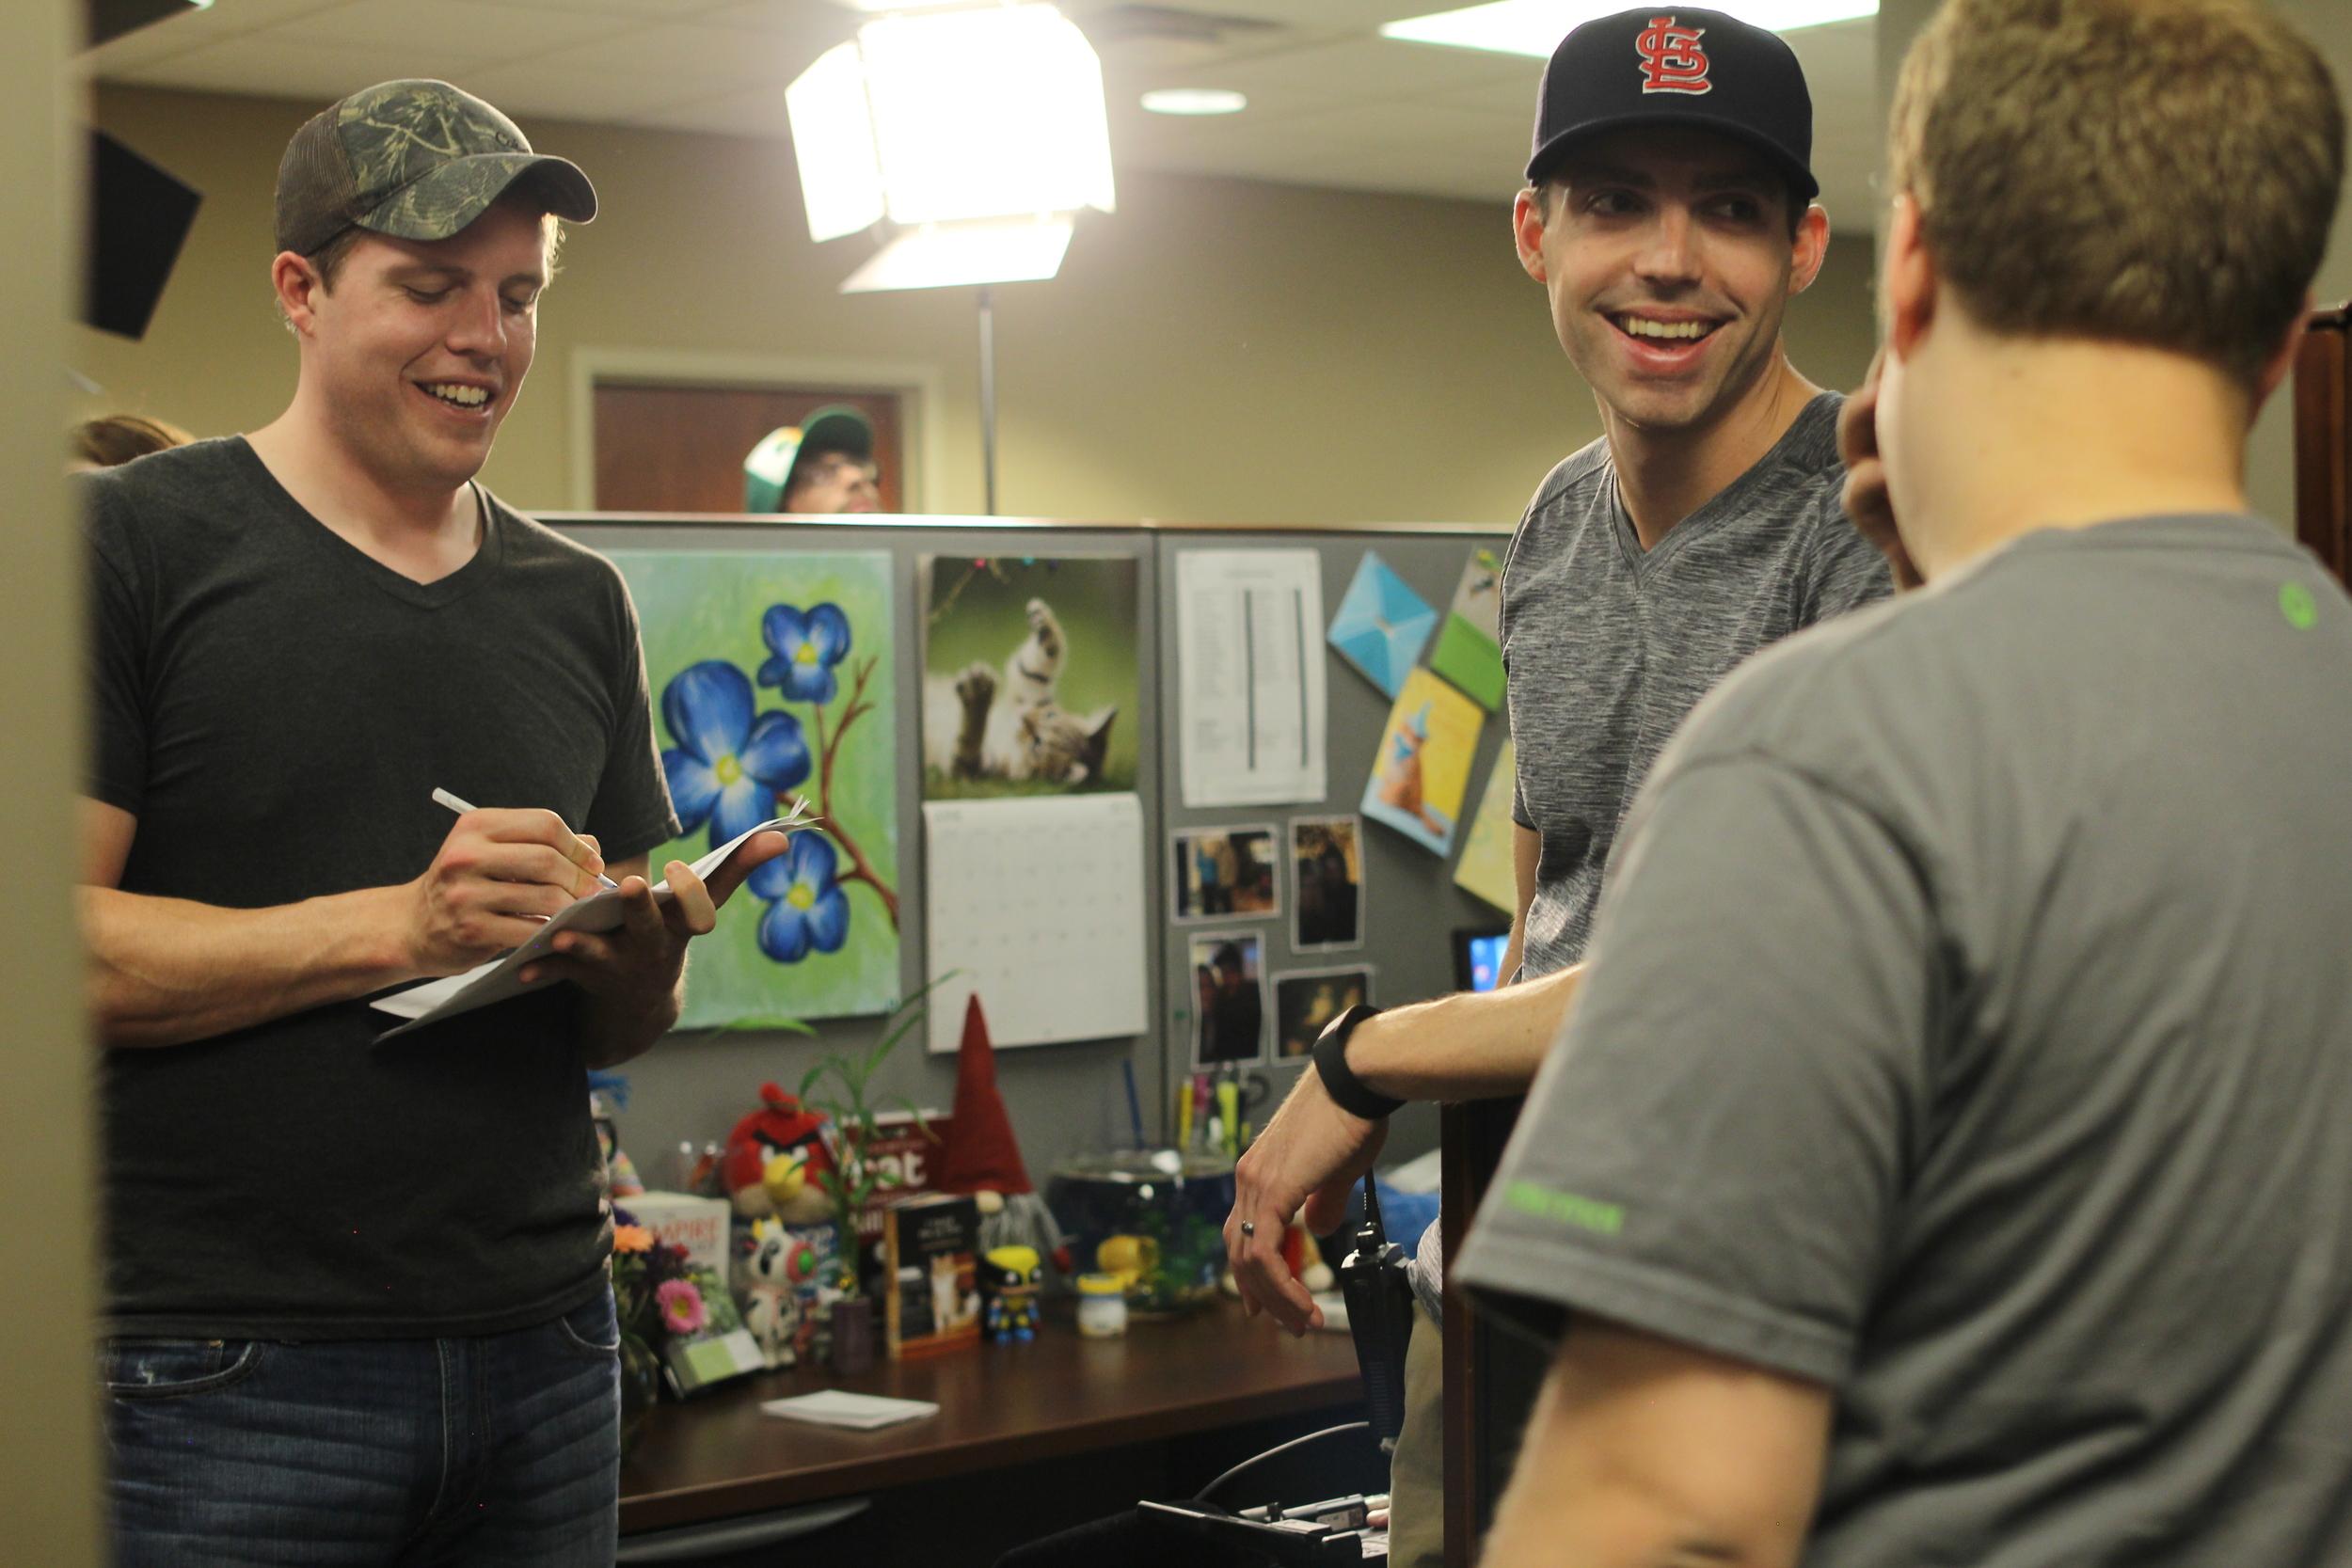 Luke McGowan (AD) & Mike Rohlfing (DP/Producer)